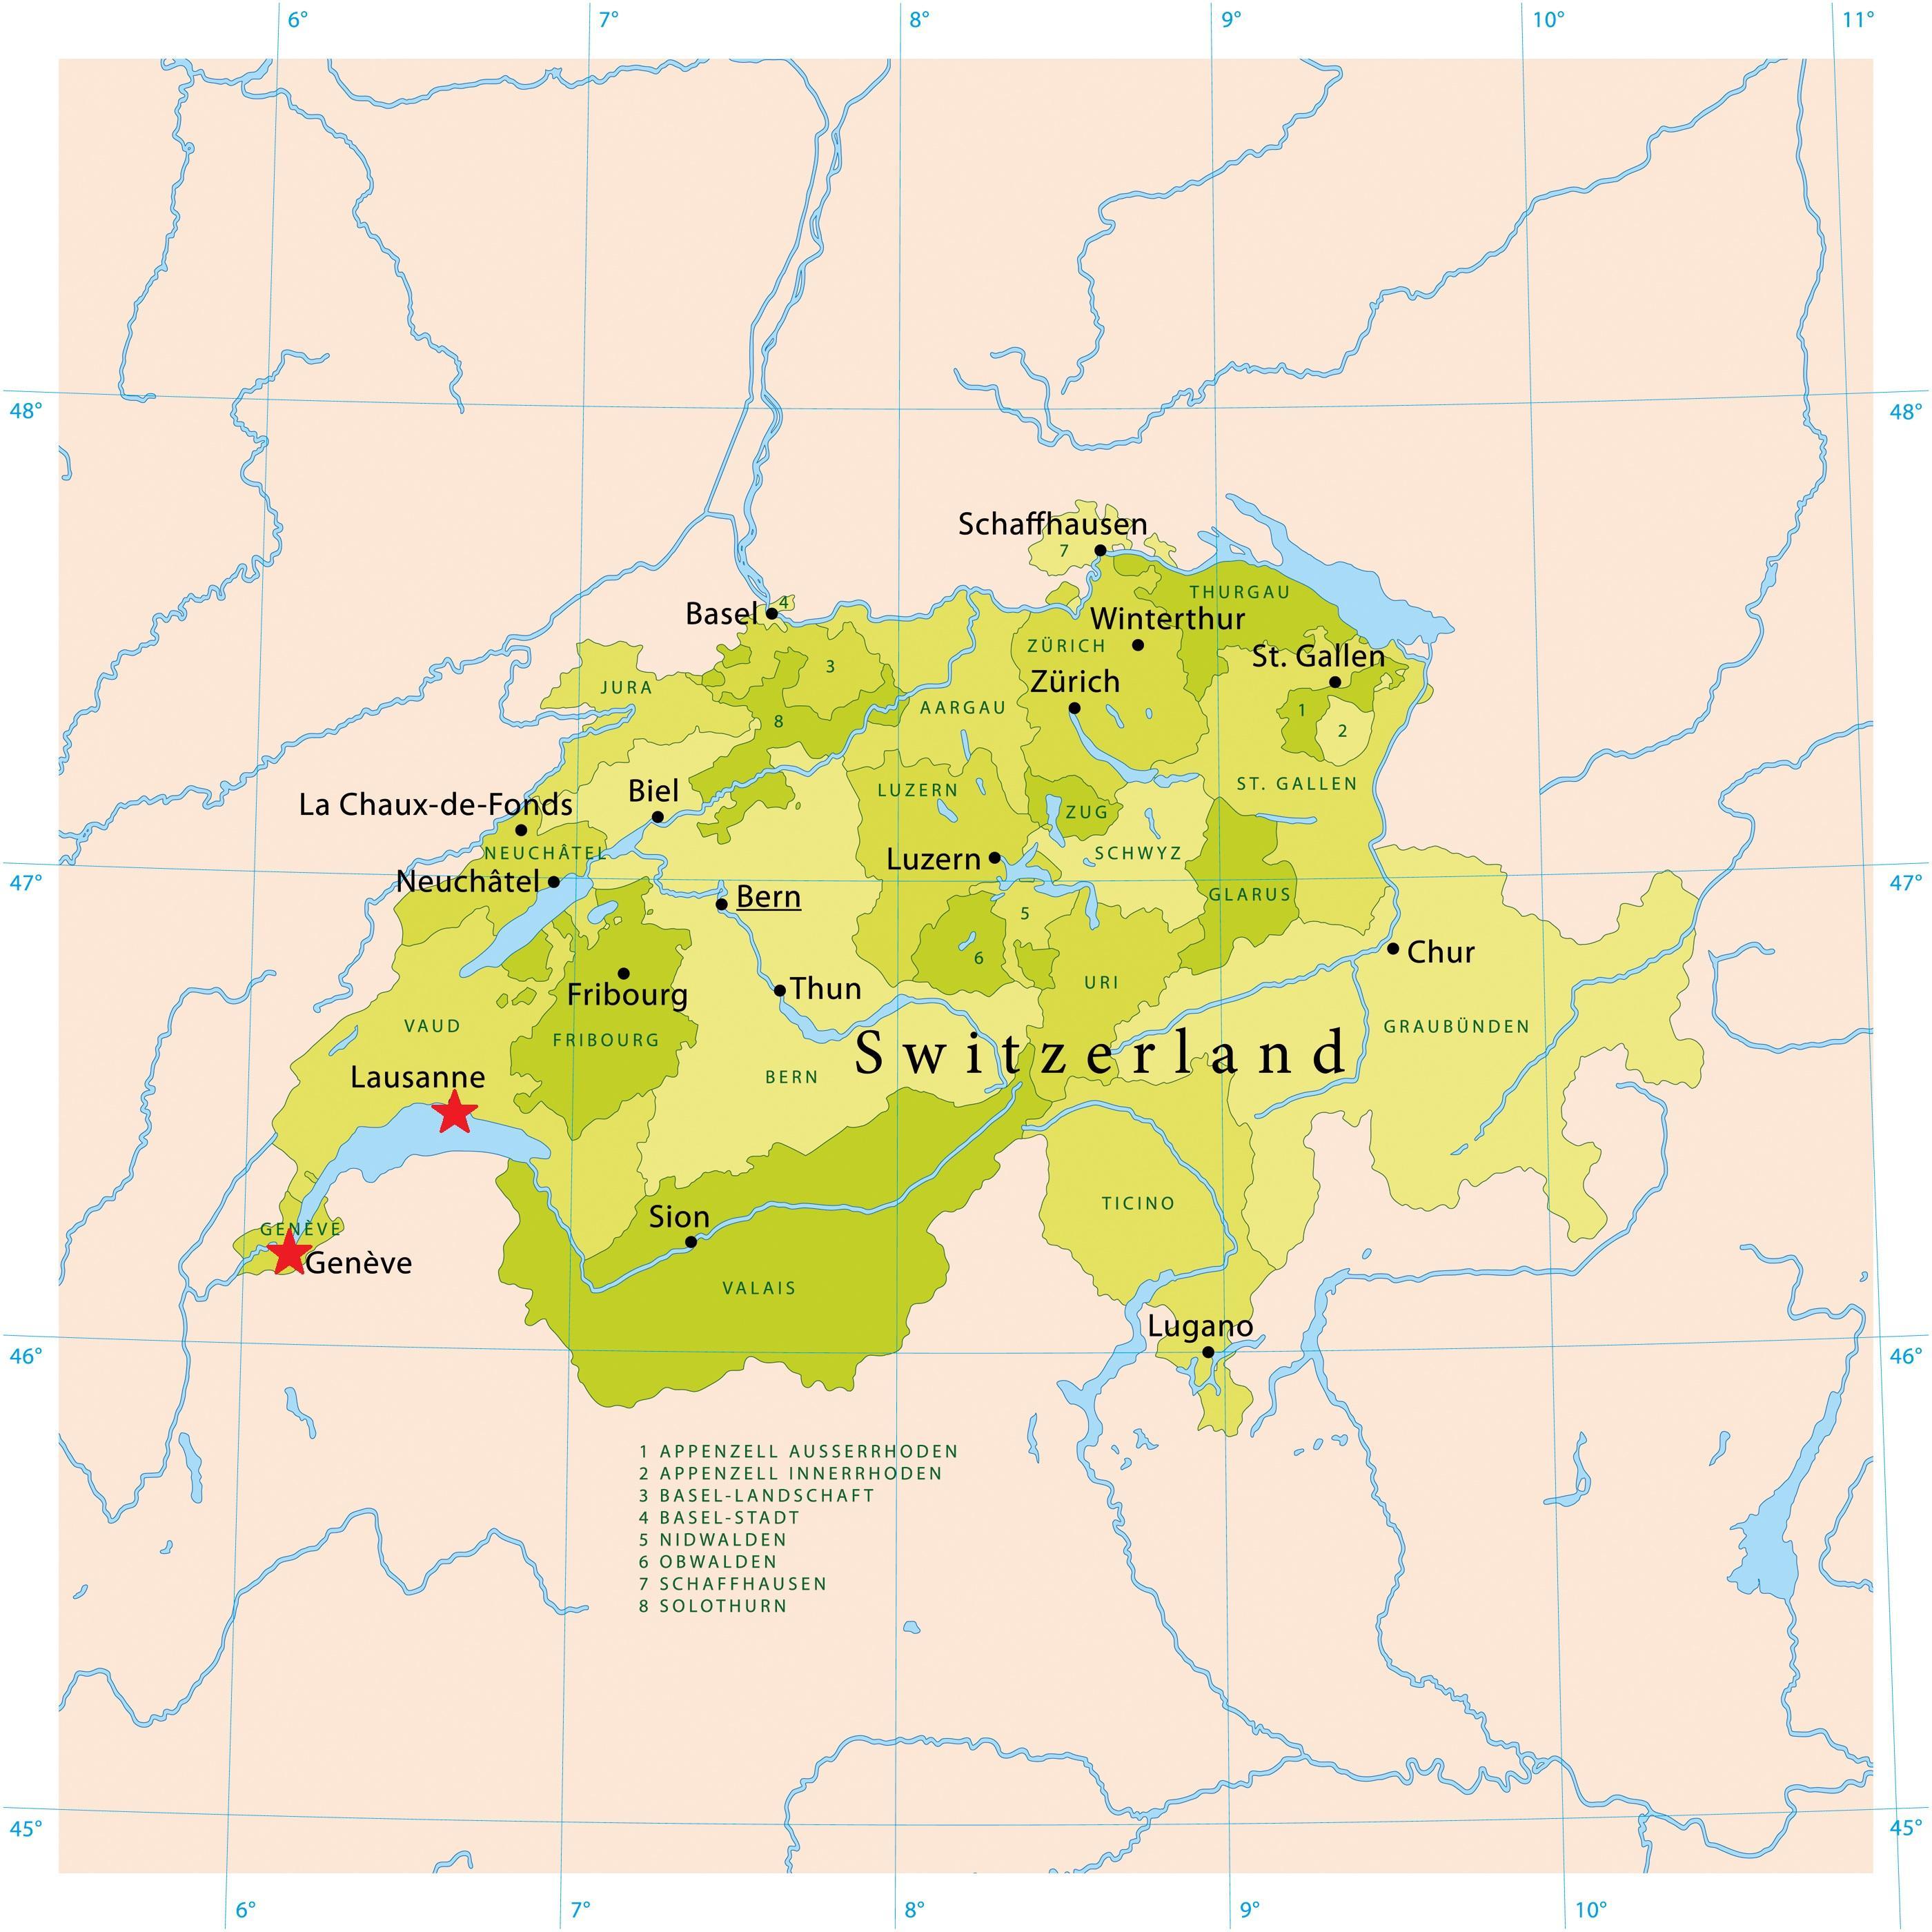 kart stadt Lake geneva, sveits kart   Kart over lake geneva, sveits (Vest  kart stadt